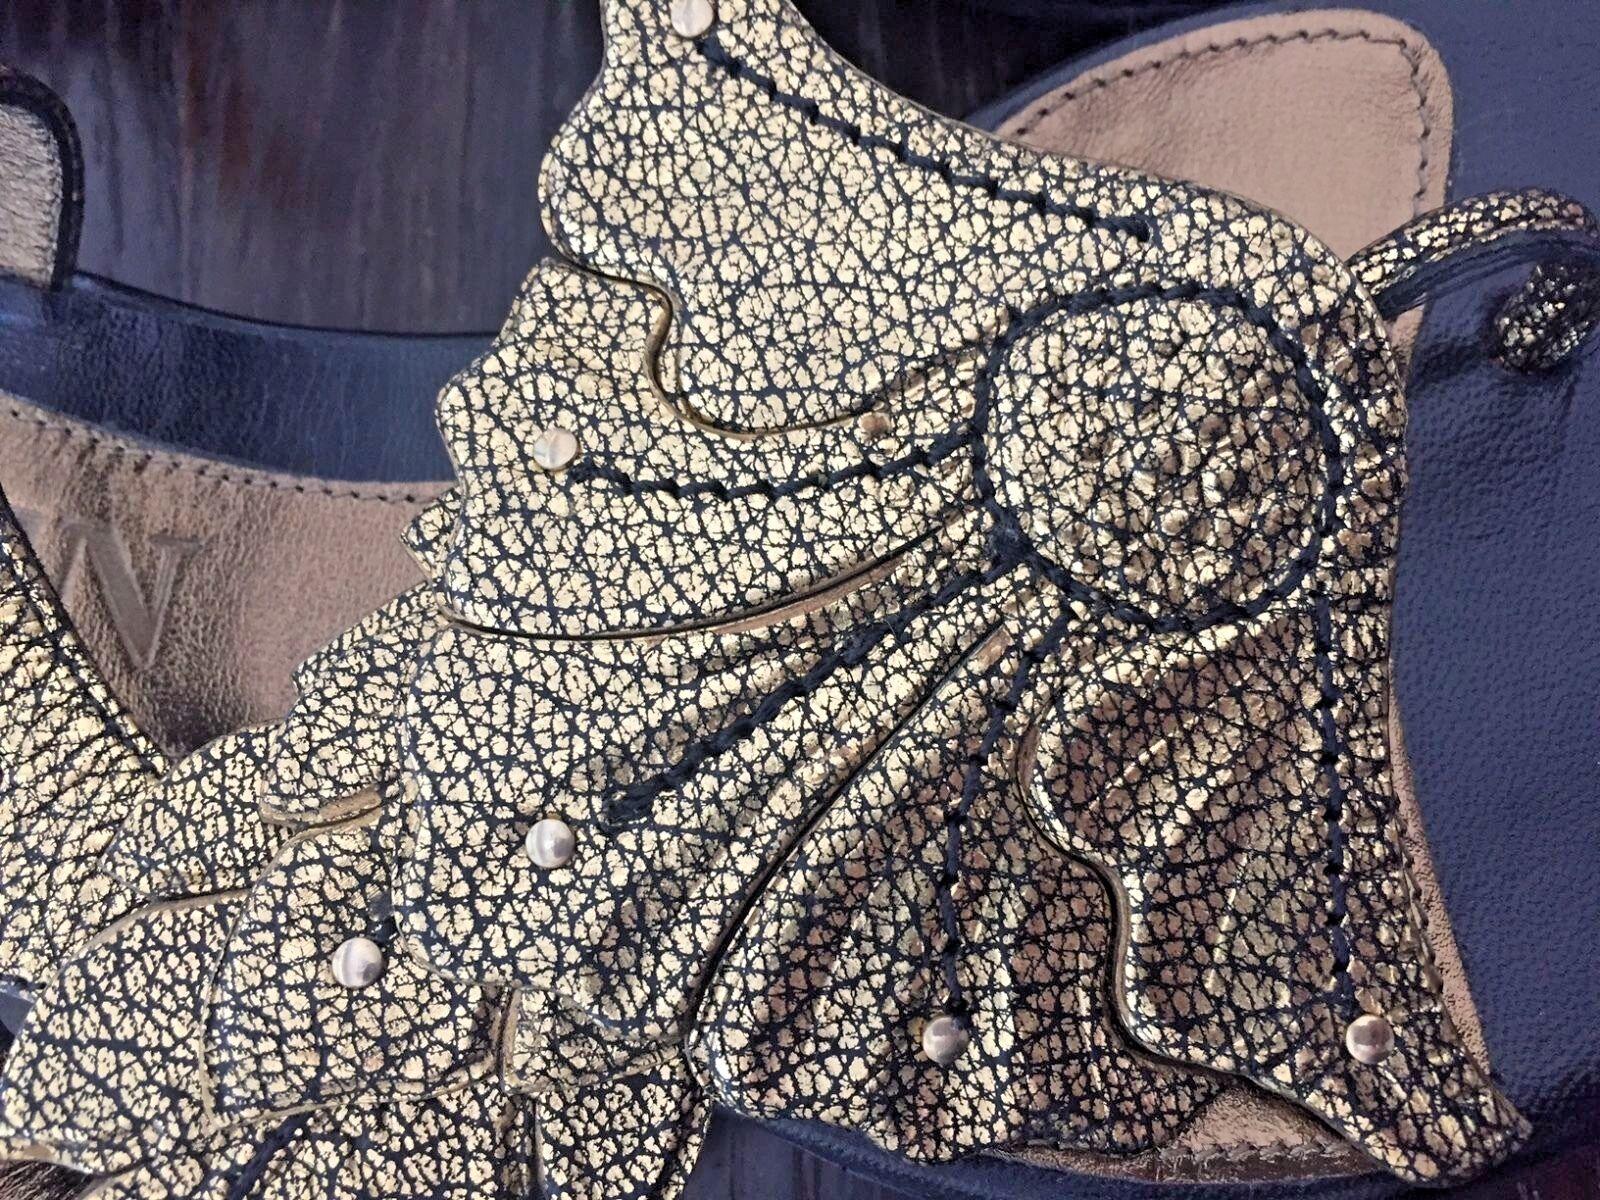 Alexander McQueen AMAZING sandals metallic  leaf motif SOLD SOLD SOLD OUT NEW 1d36ba